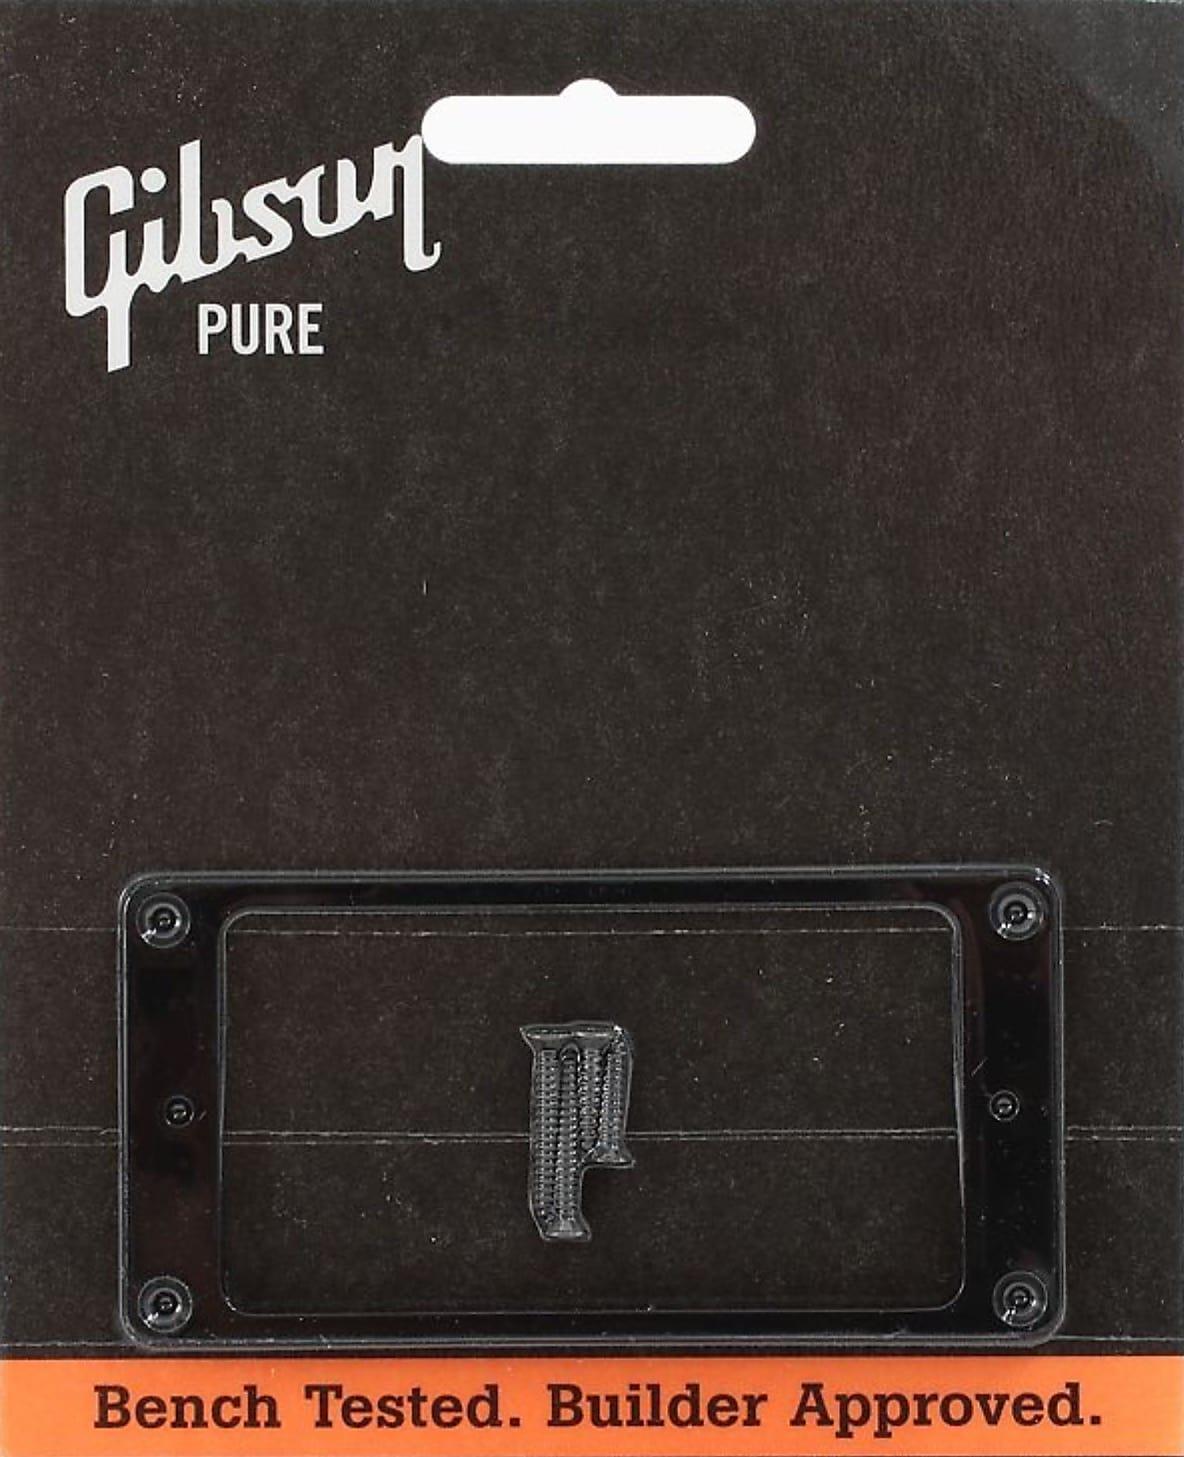 Gibson-PRPR-010 Neck Pickup Mouting Ring, Black